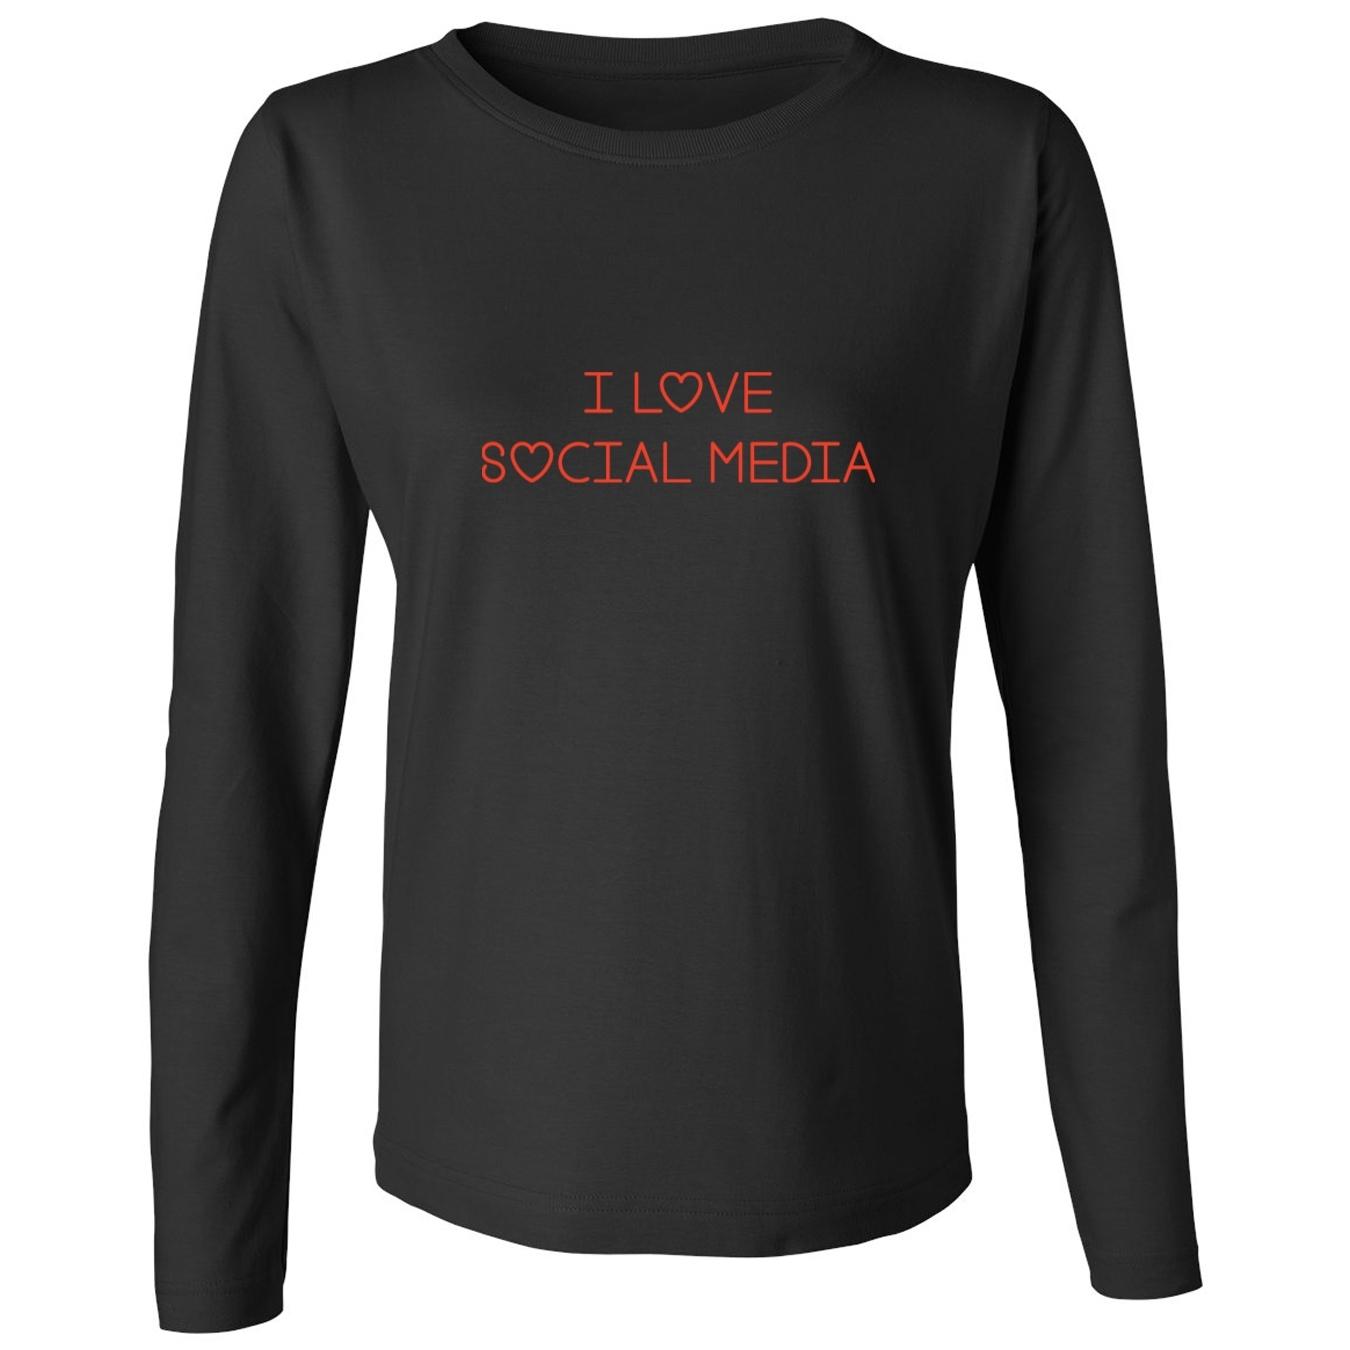 Mashed Clothing I Love Social Media Women's Long Sleeve T-Shirt at Sears.com